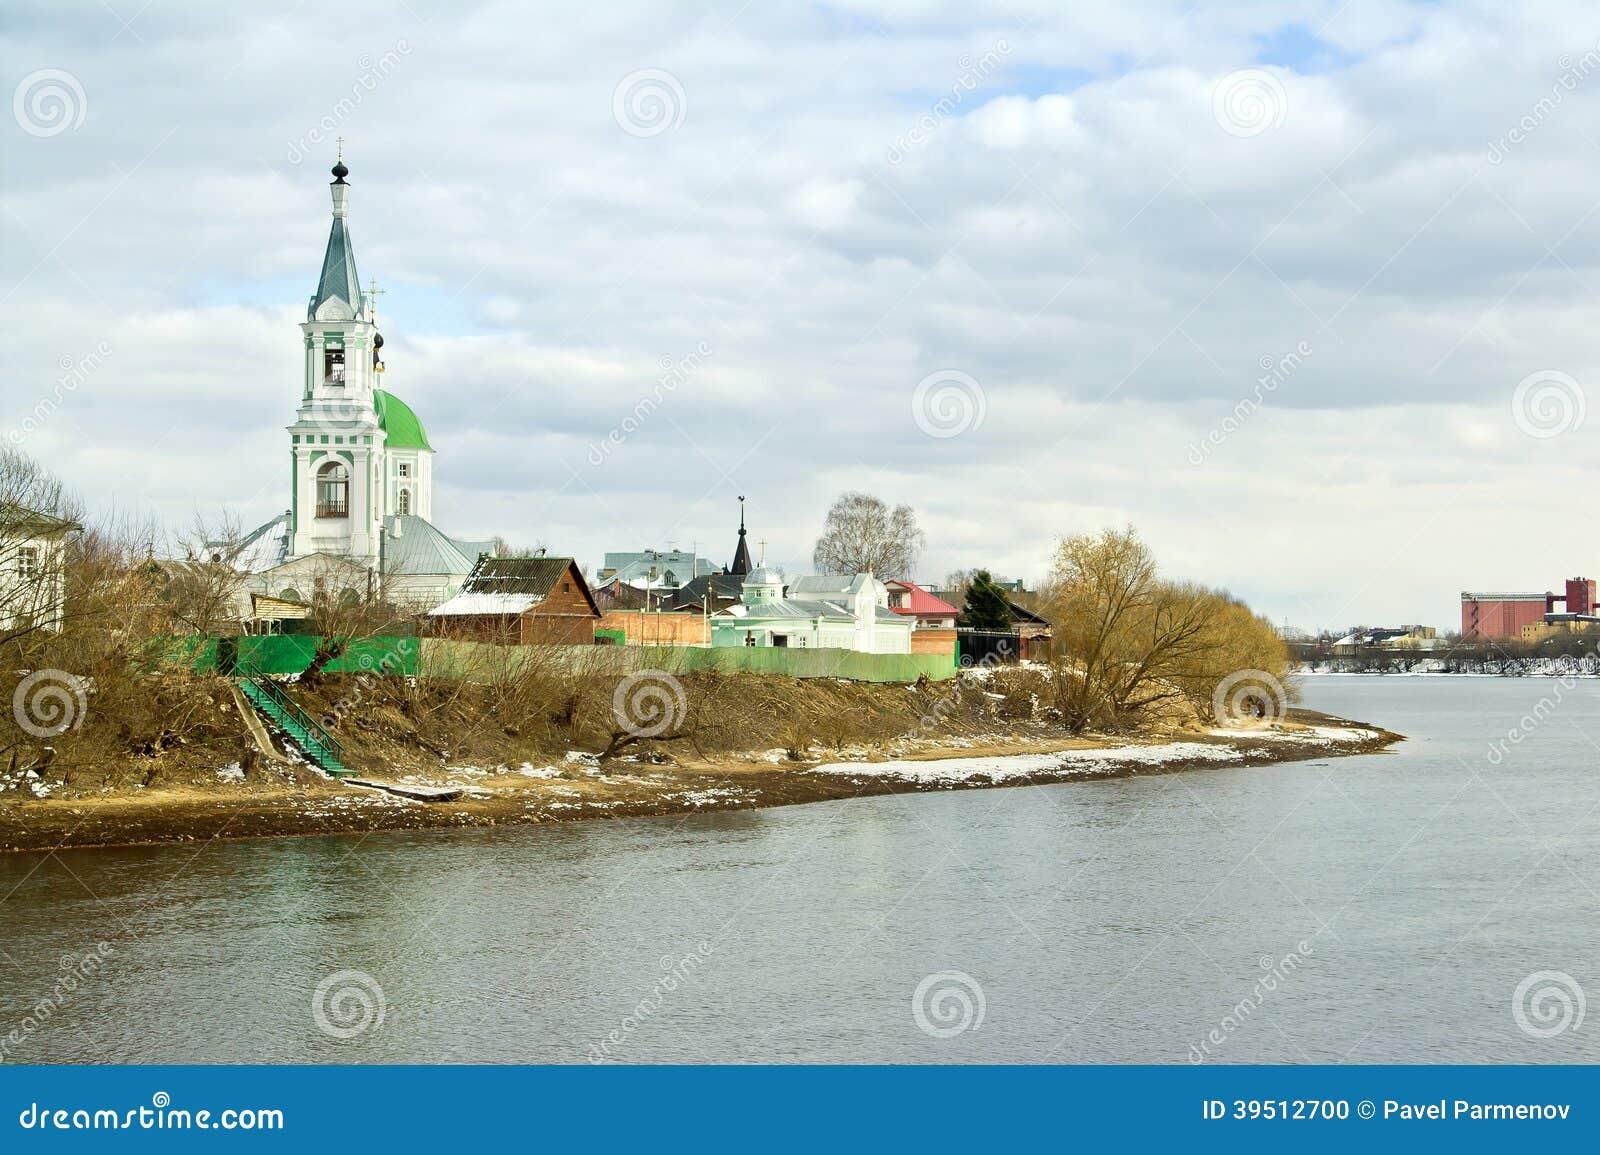 Tver. Catherine nunnery. Church of Catherine